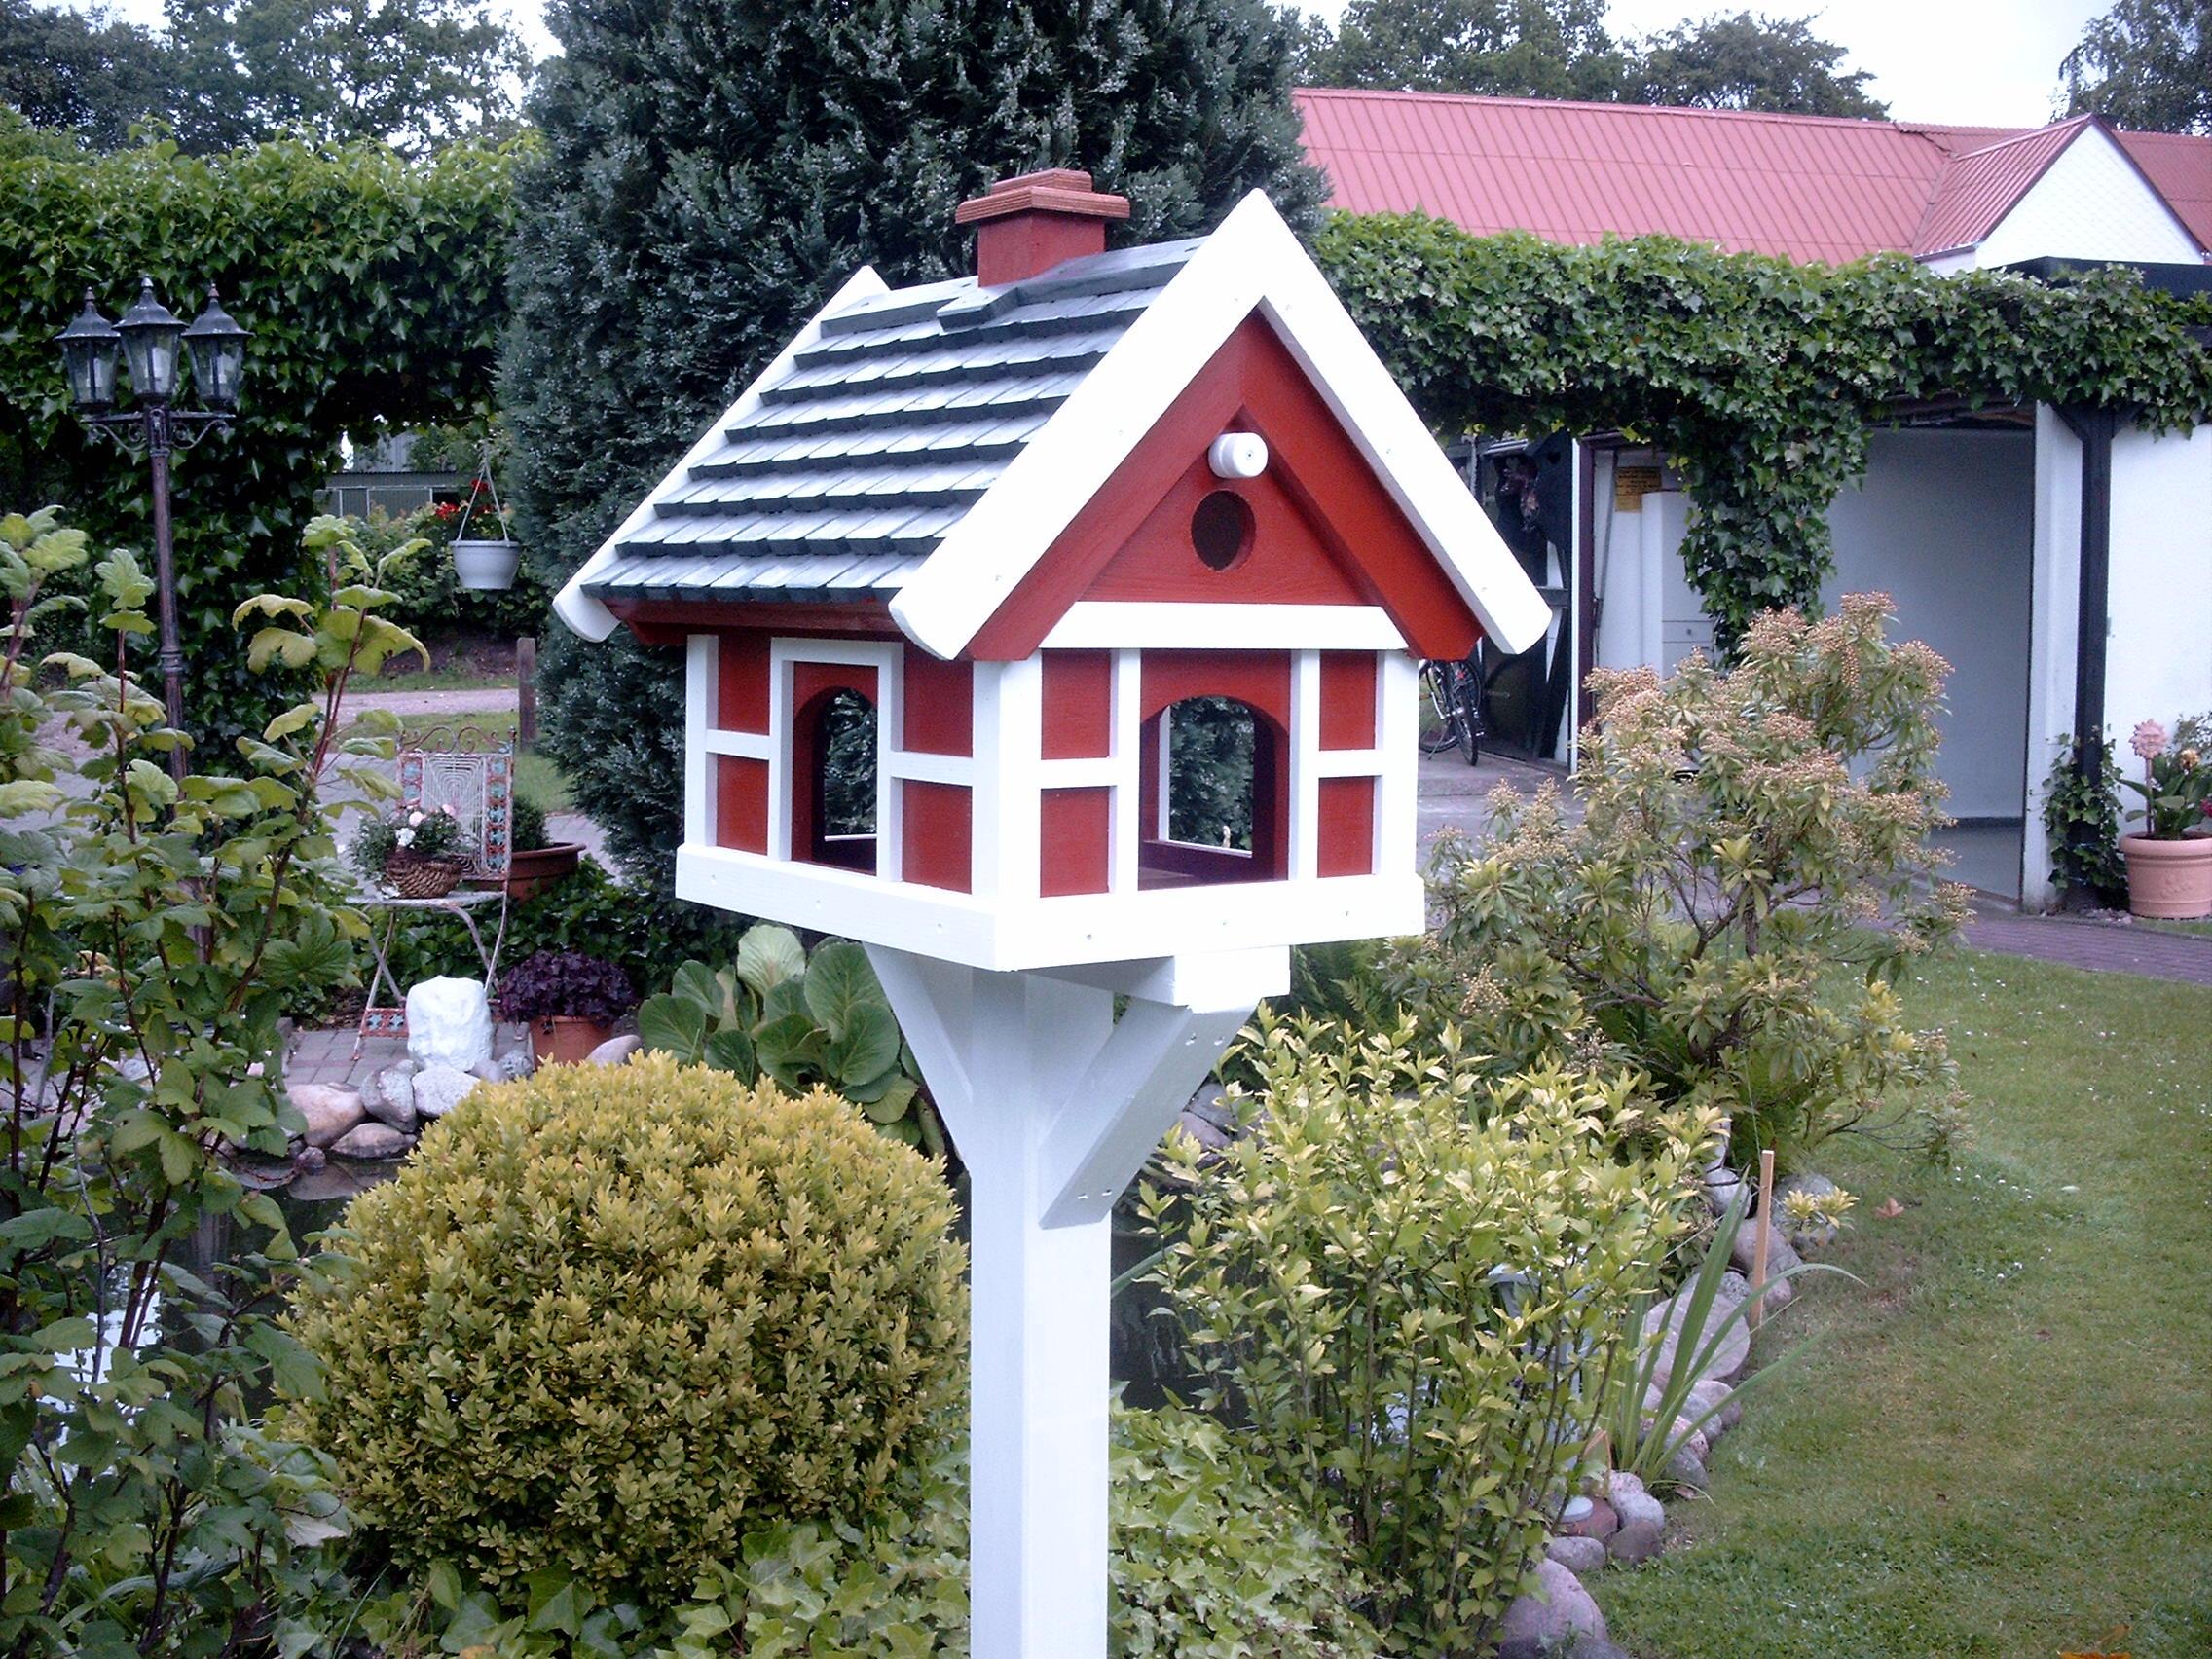 vogelfutterhaus bauanleitung kostenlos vogelfutterhaus. Black Bedroom Furniture Sets. Home Design Ideas